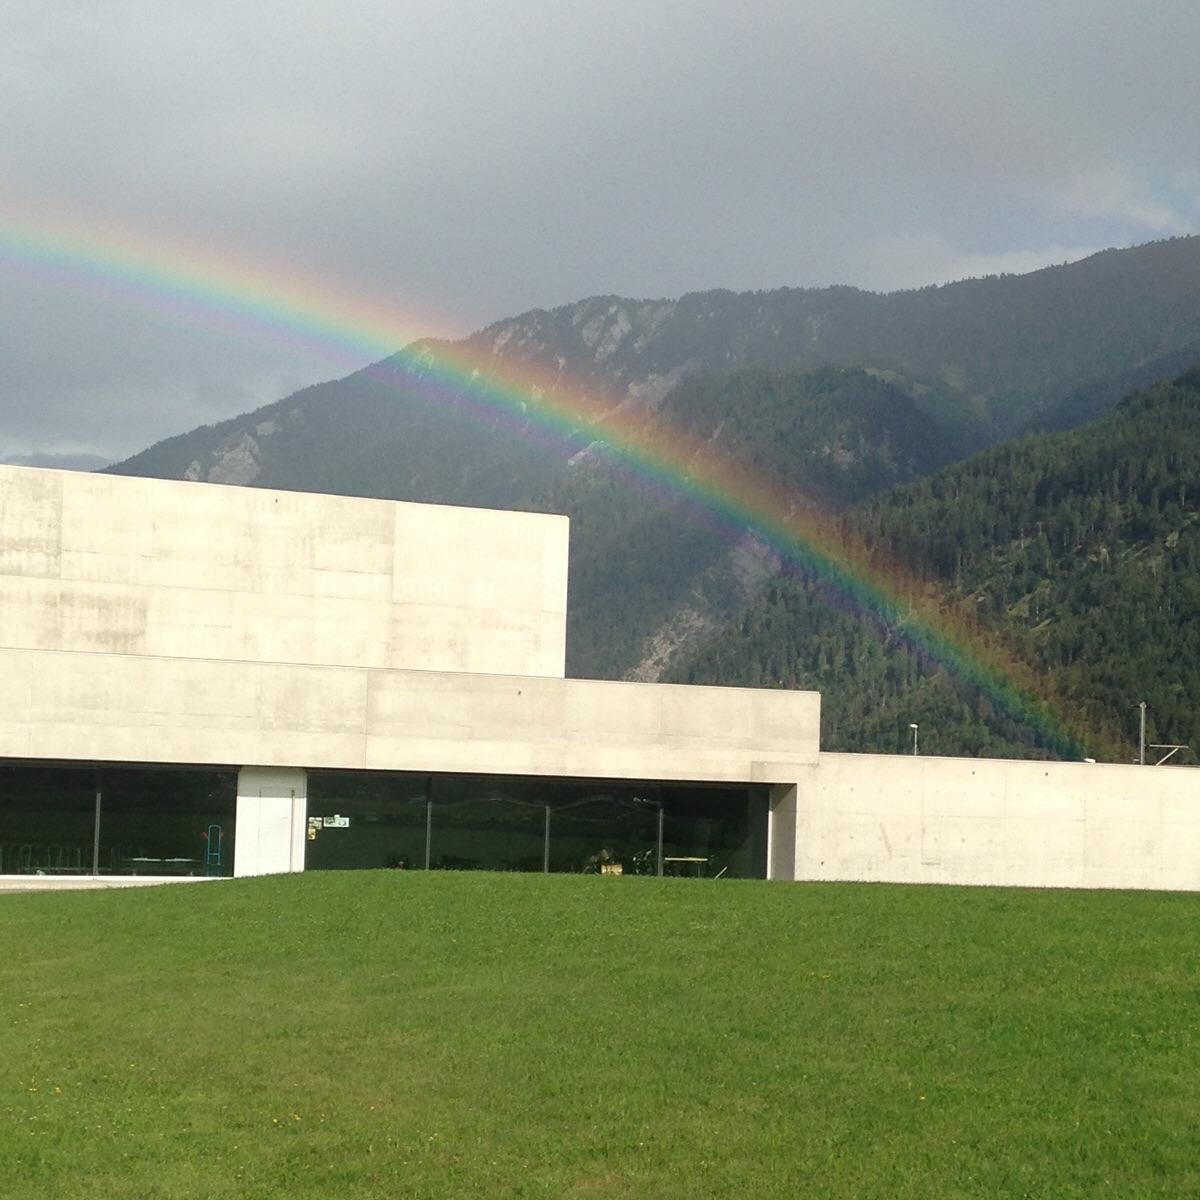 Rainbow over an elementary school. Switzerland. ( architect: unknown)